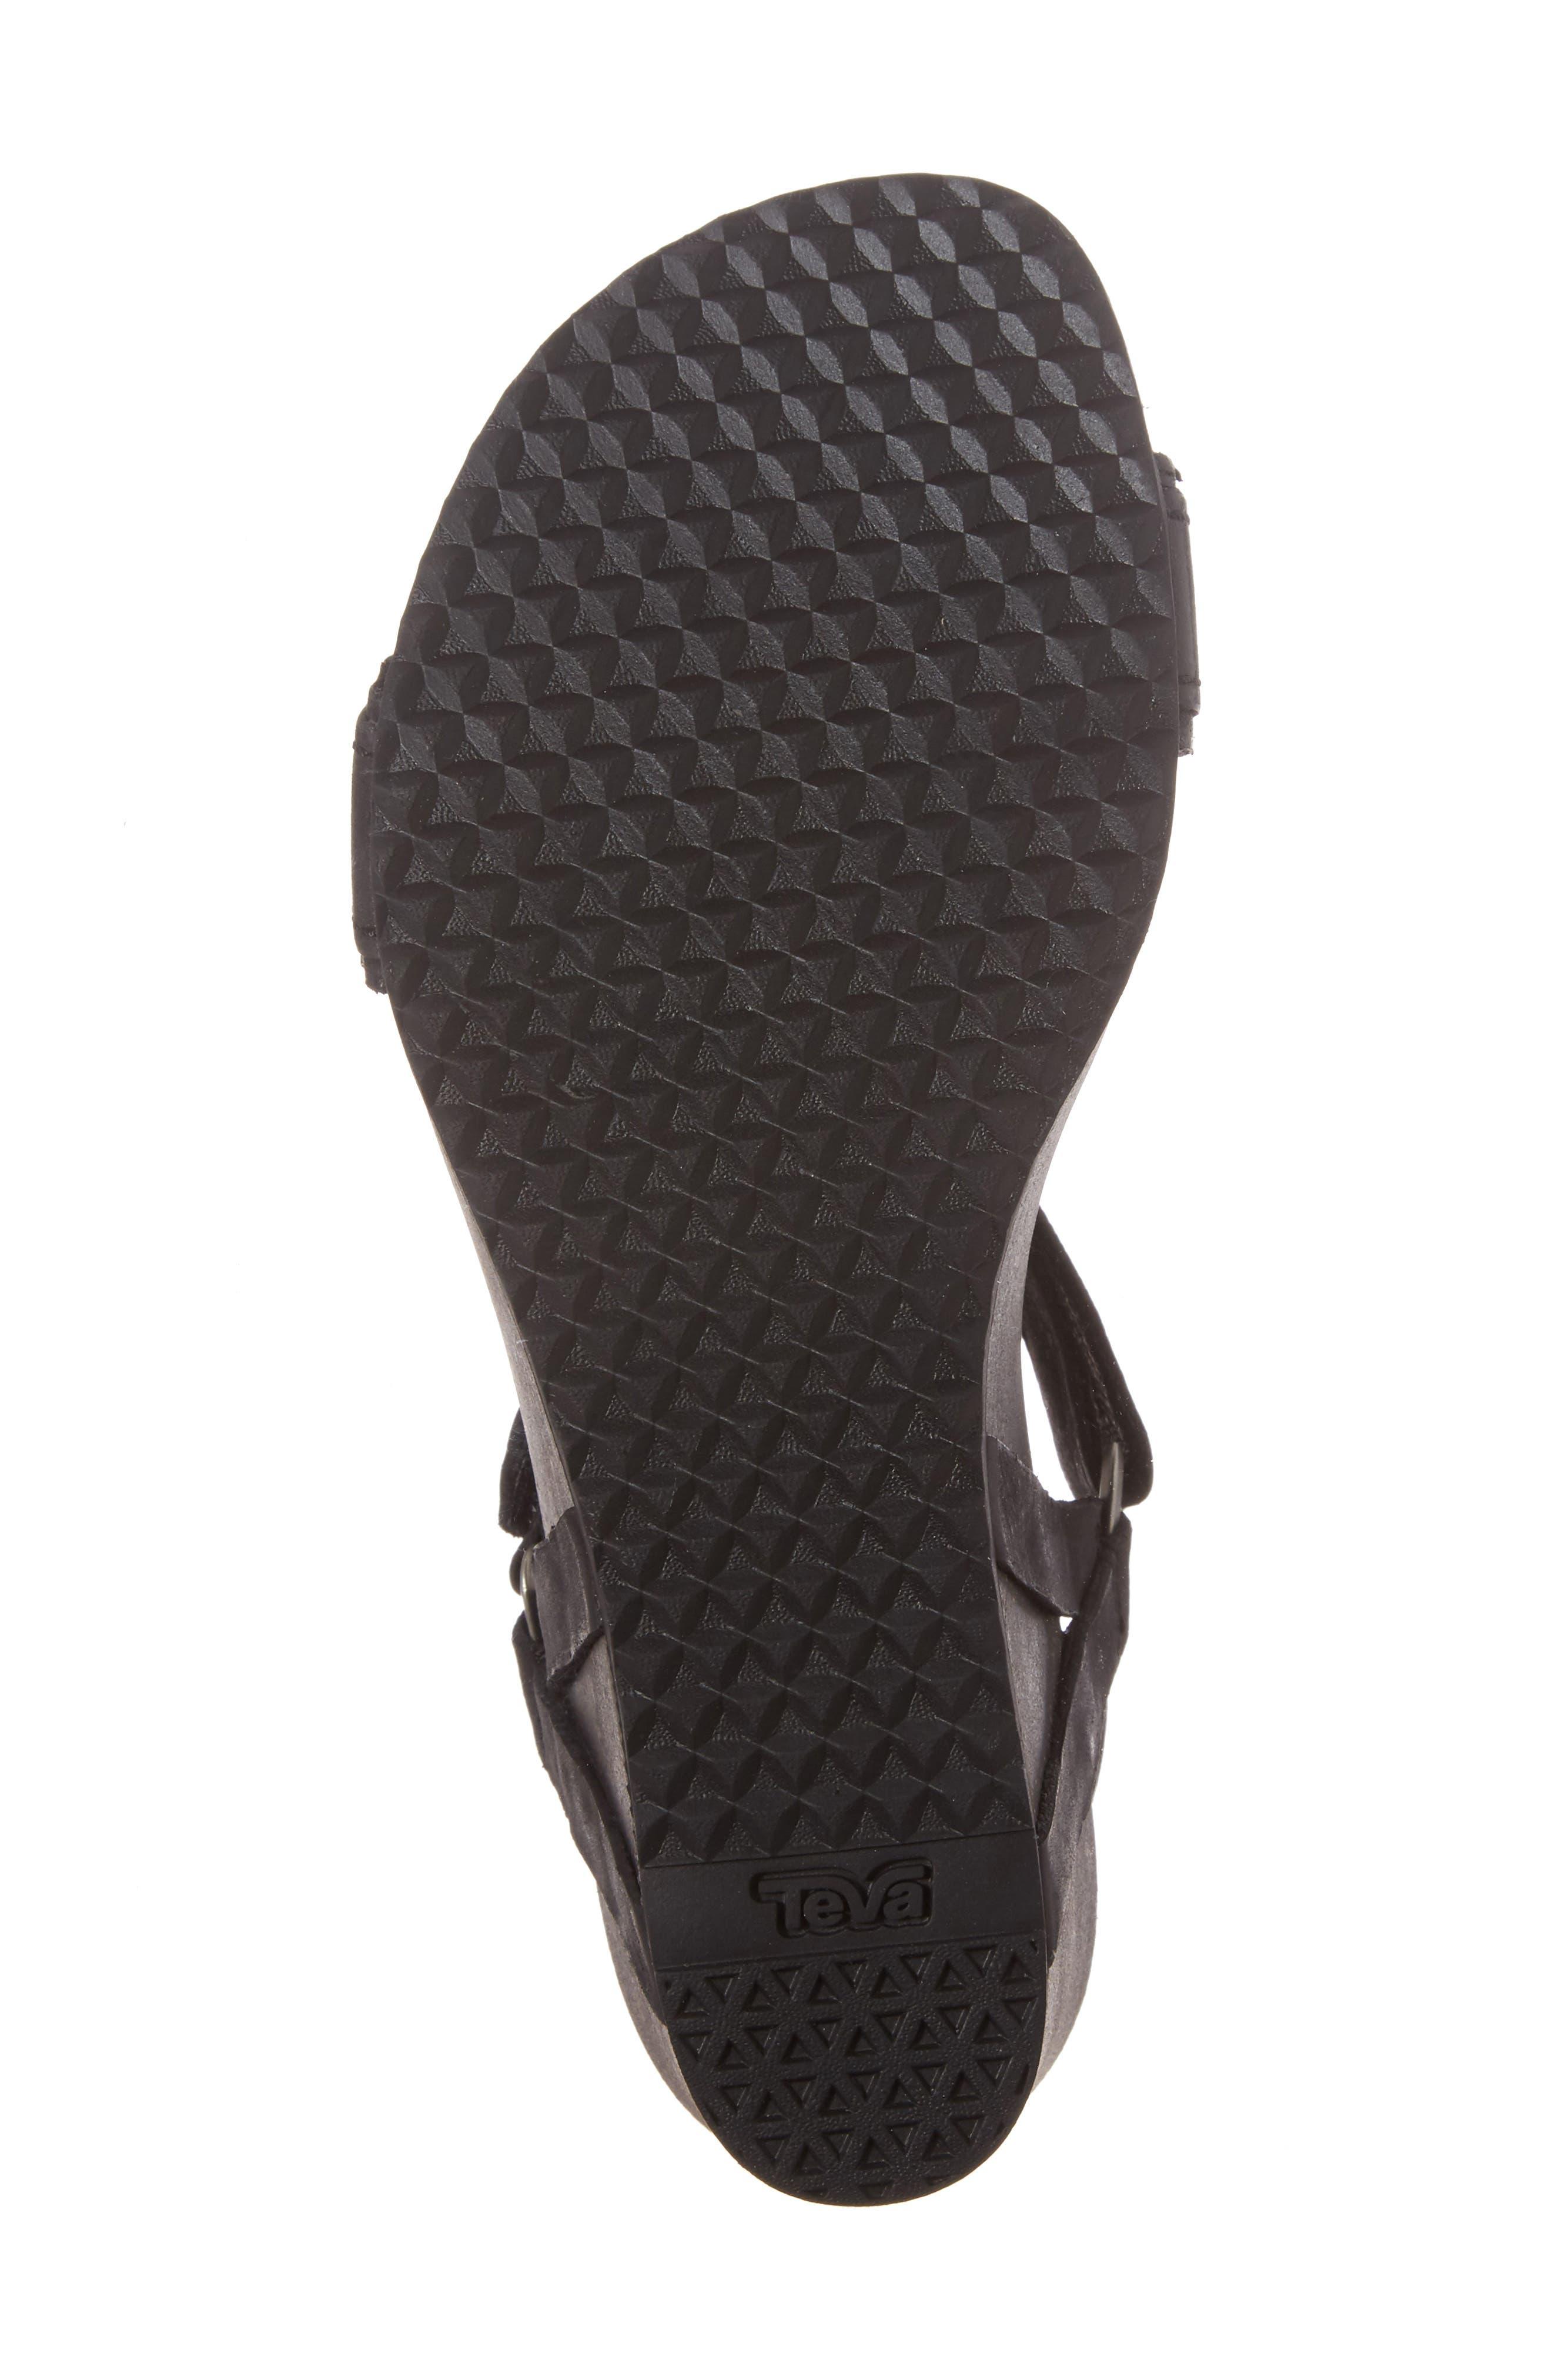 Ysidro Stitch Wedge Sandal,                             Alternate thumbnail 6, color,                             Black Leather